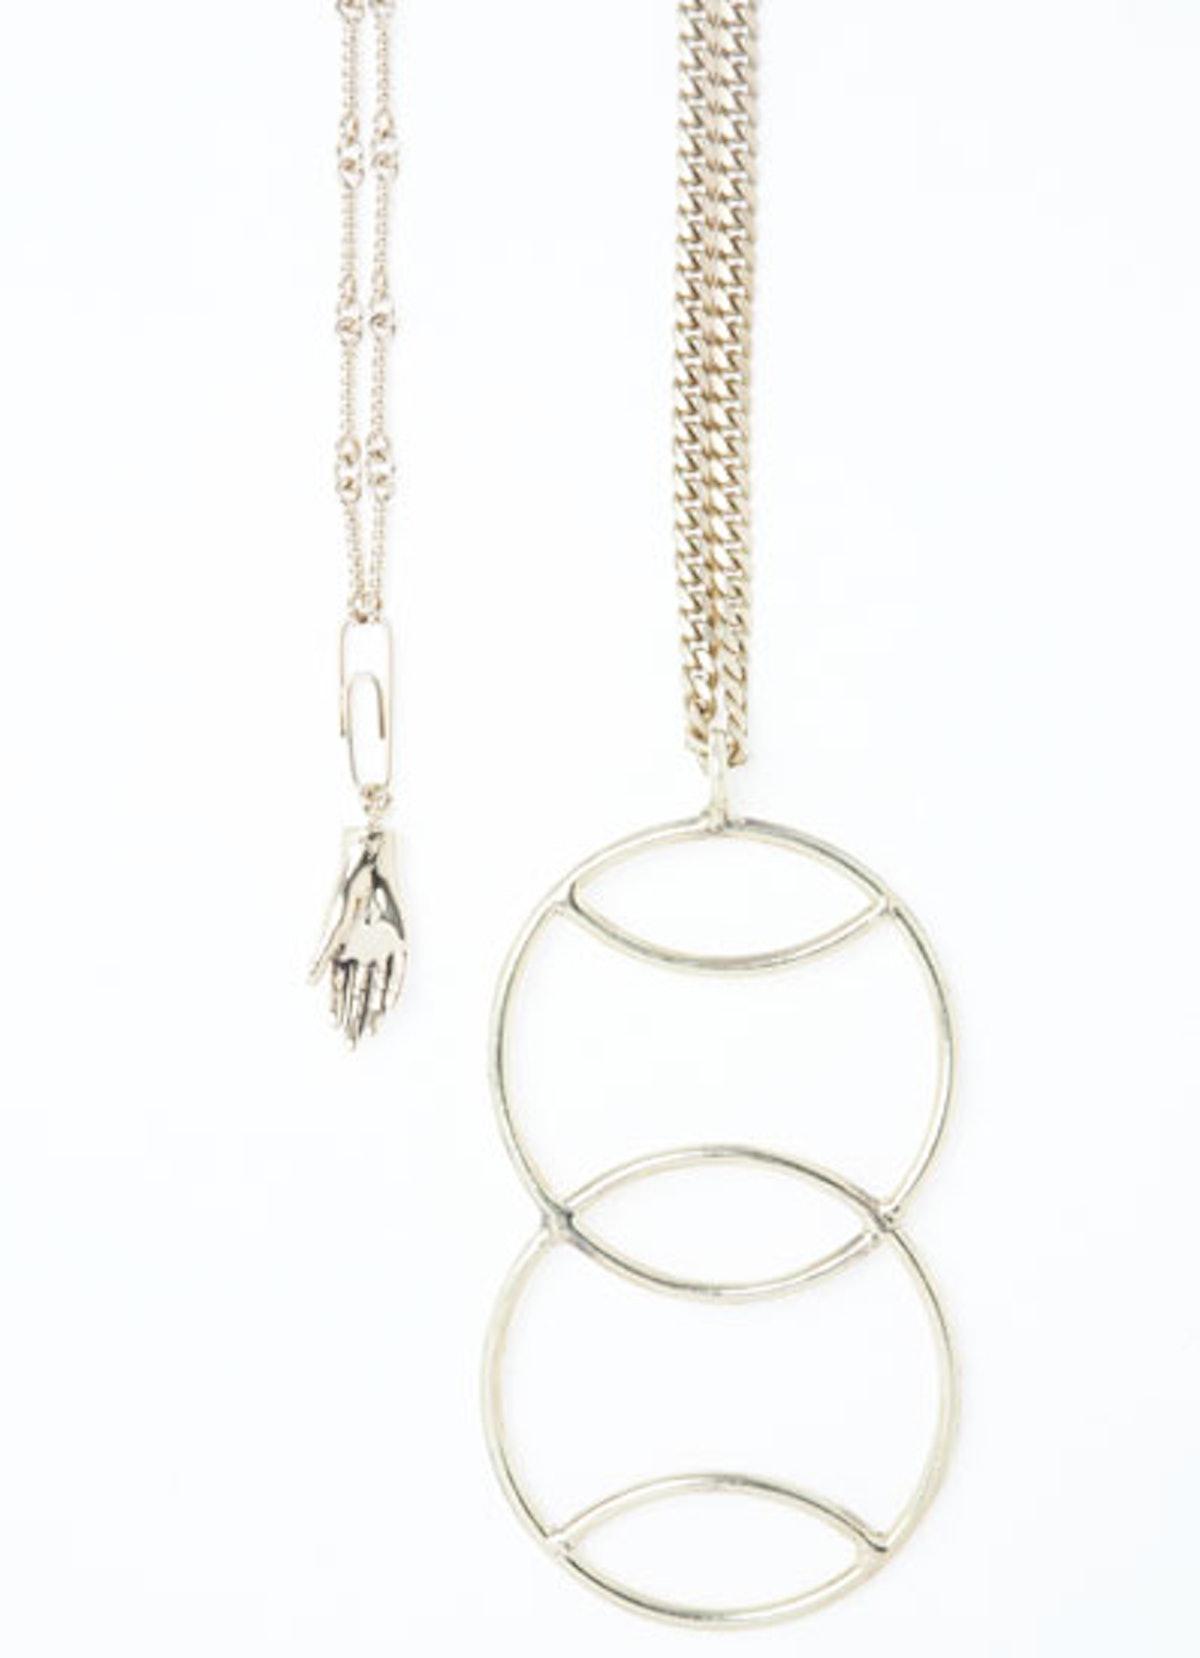 acss_gold_jewelry_03_v.jpg